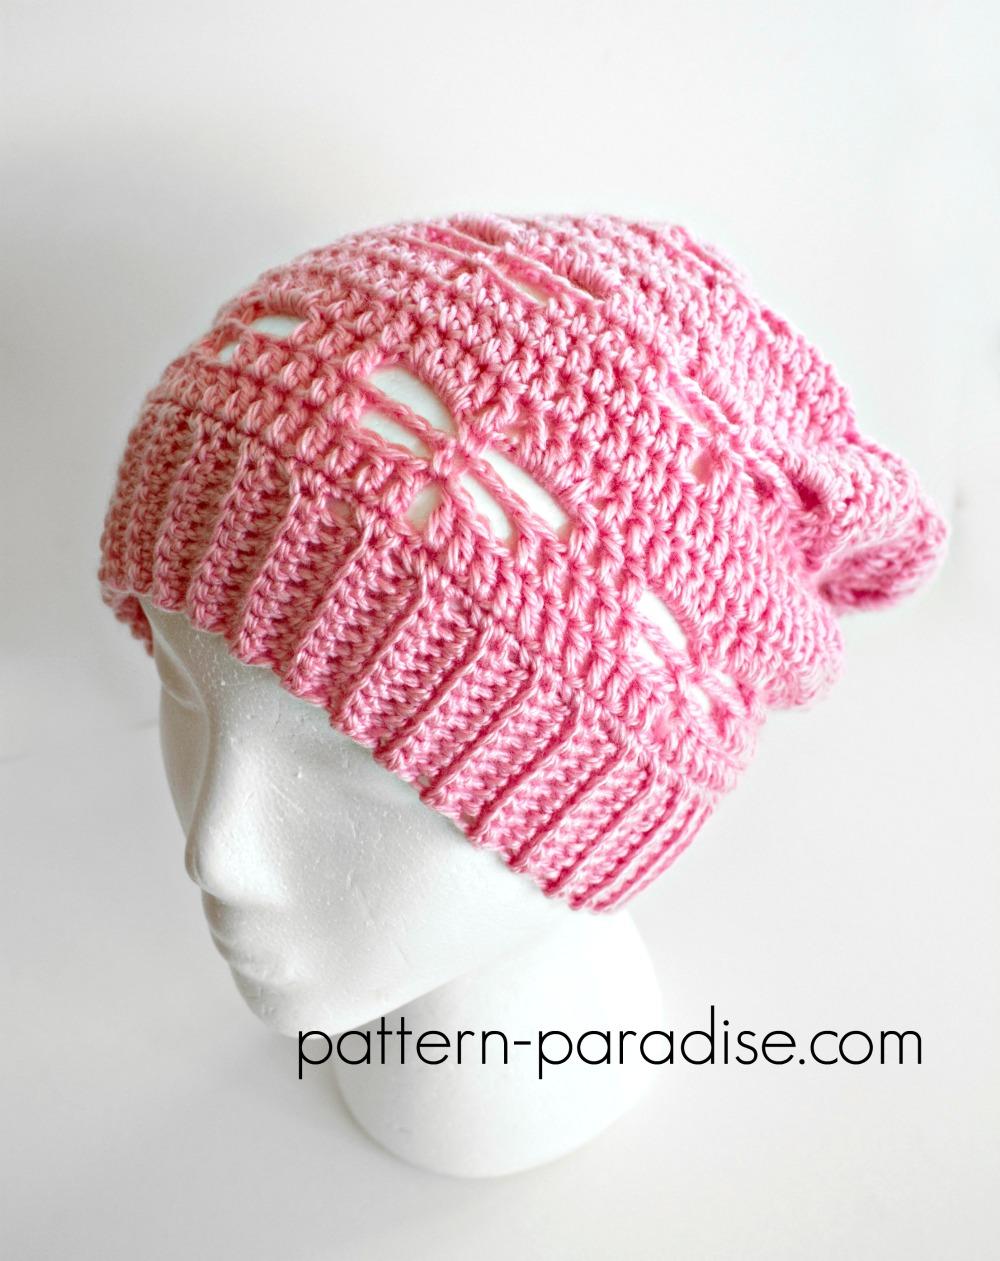 Free Crochet Pattern: Dragonfly Slouchy Hat Pattern Paradise